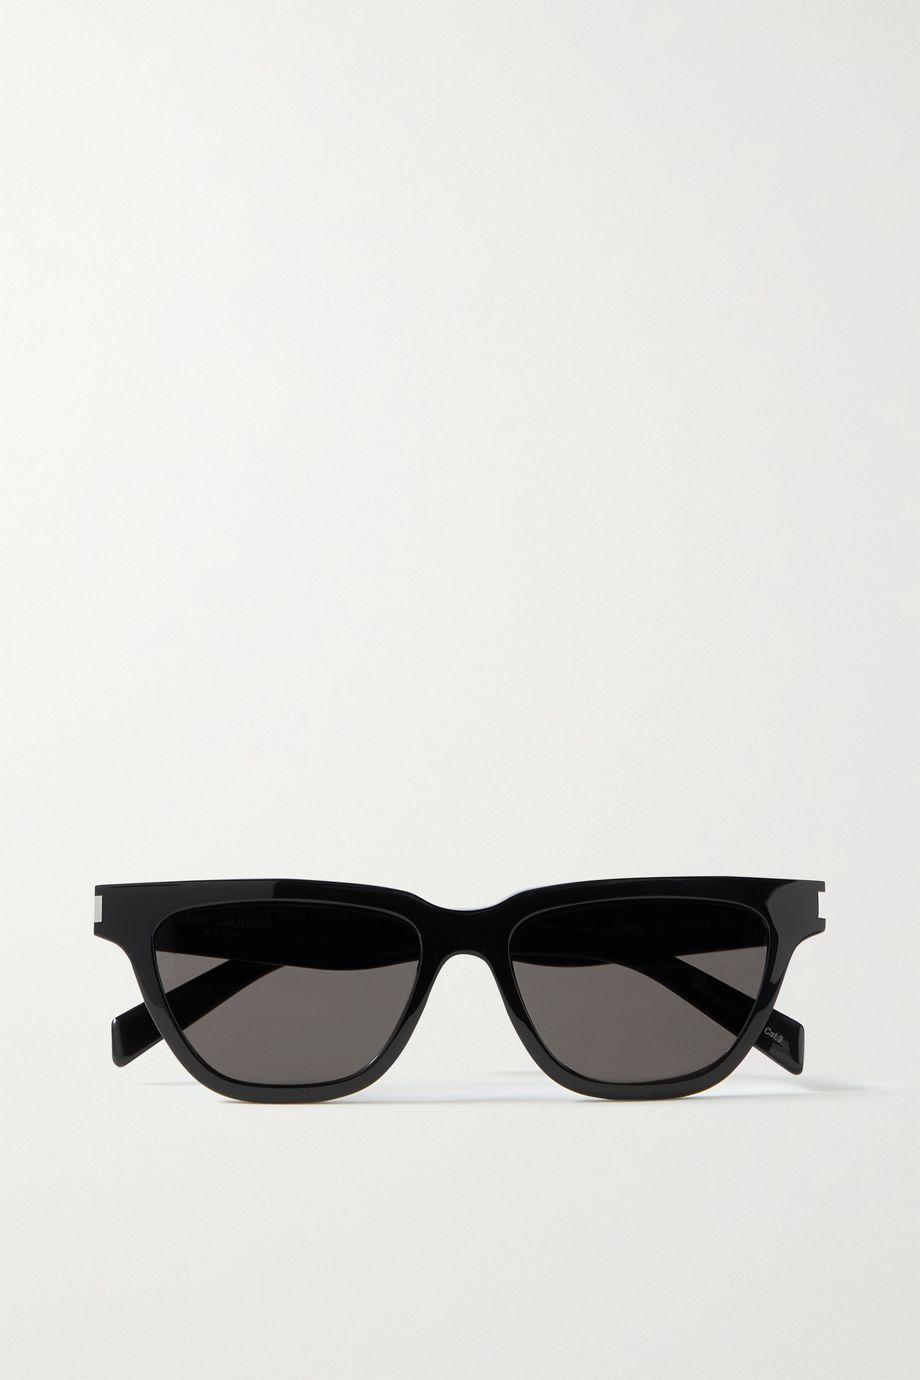 SAINT LAURENT Suplice D-frame acetate sunglasses